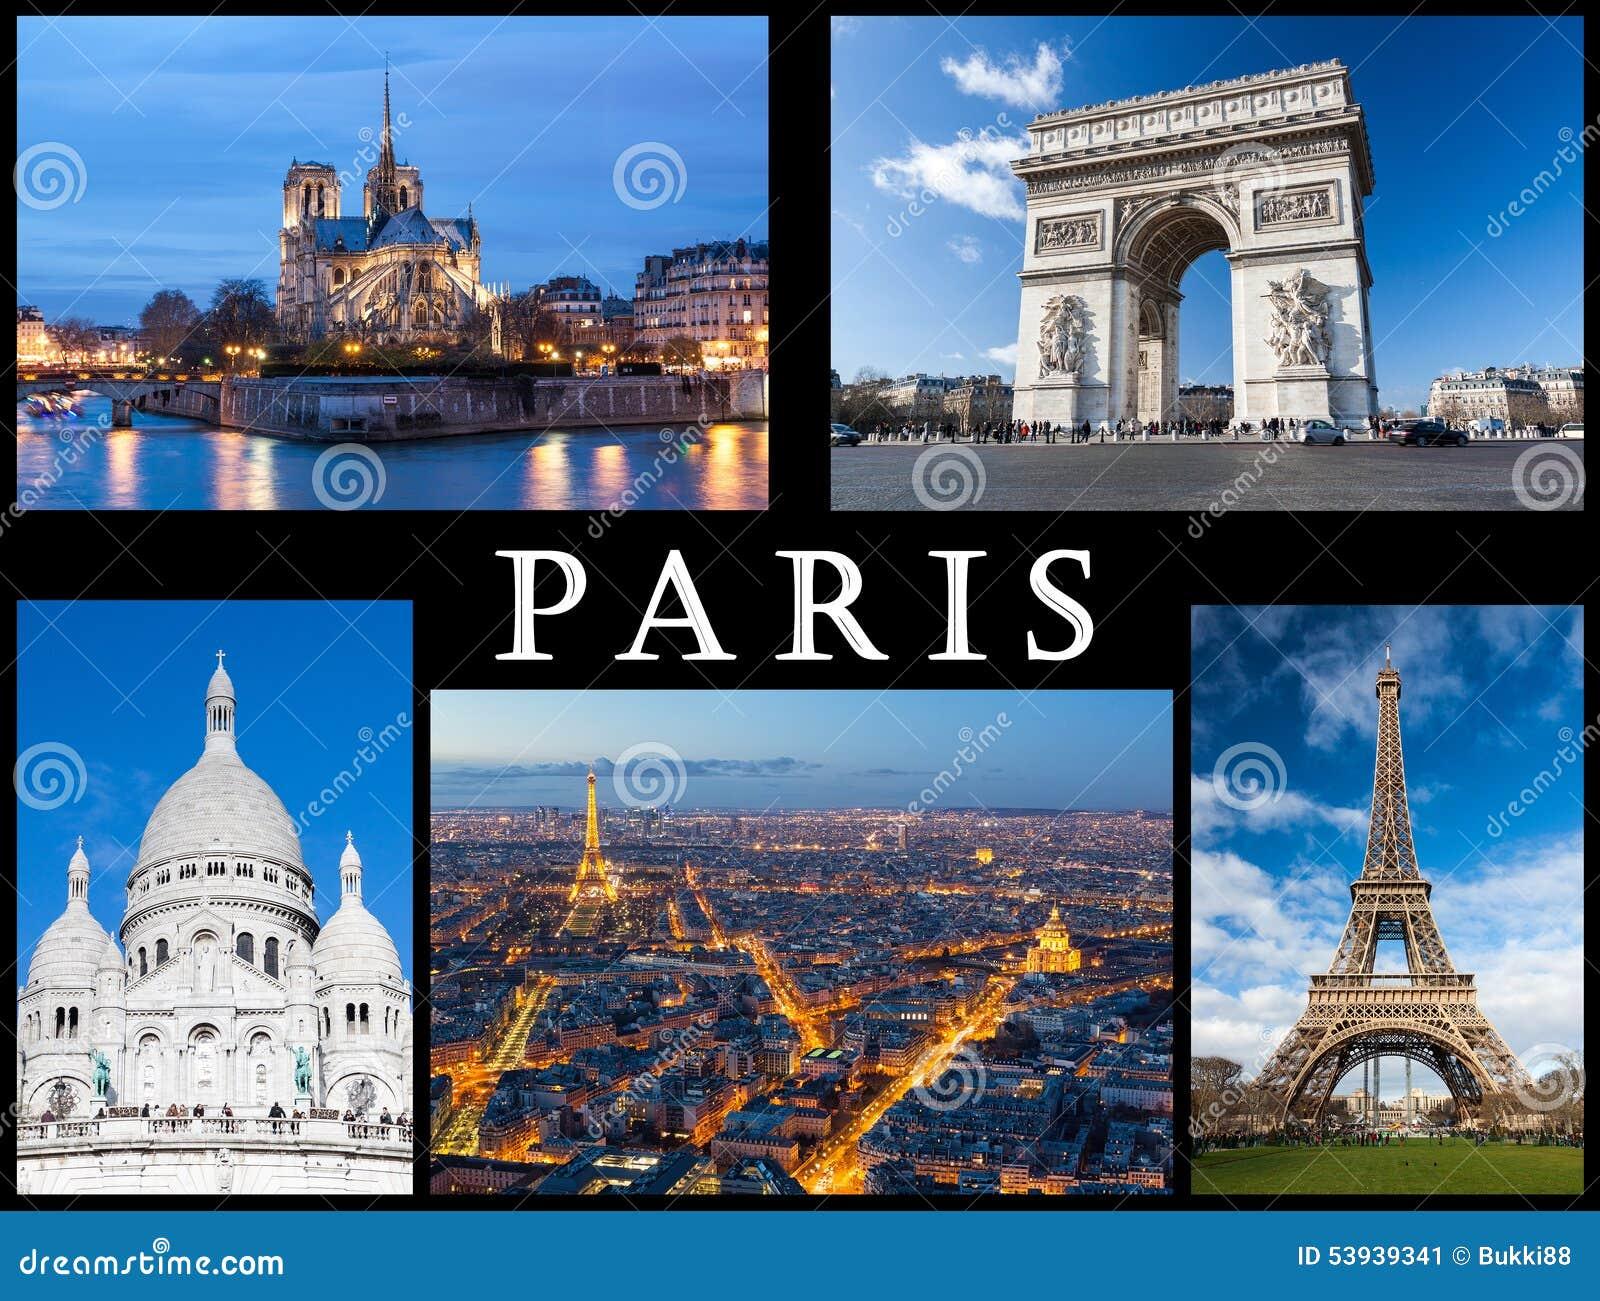 Paris Postcard: Notre Dame, Eiffel Tower, Basilica Of Sacred Heart, Arc Of Triumph And A Skyline ...